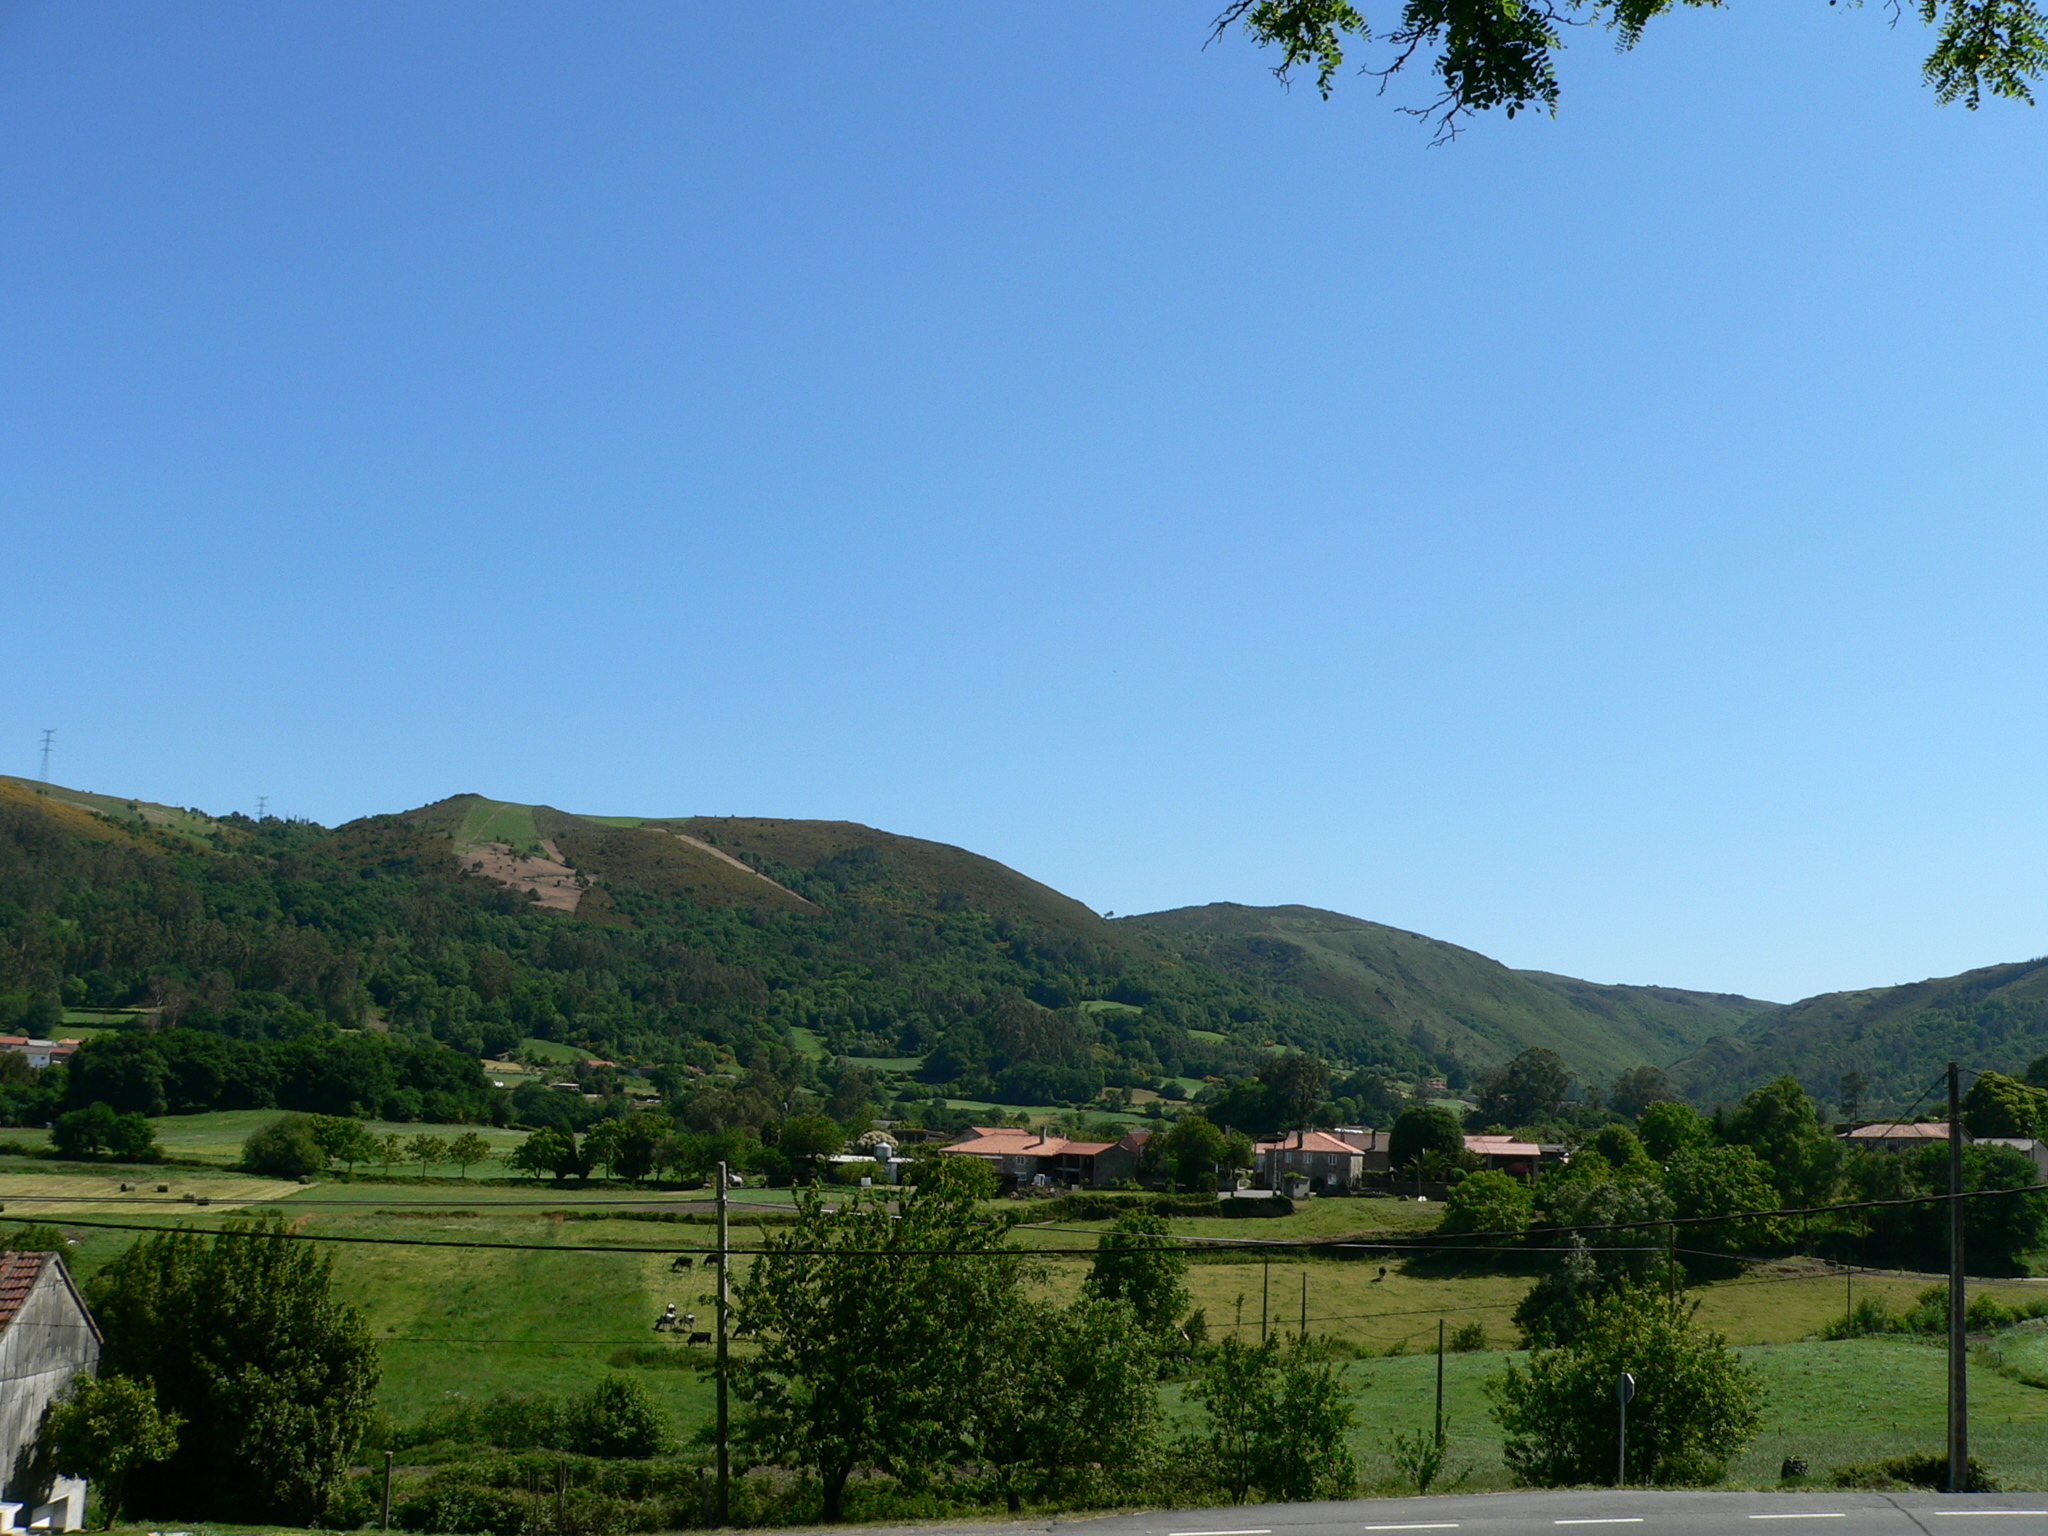 File:Vila de Cruces, Pontevedra, Spain - panoramio.jpg - Wikimedia ...